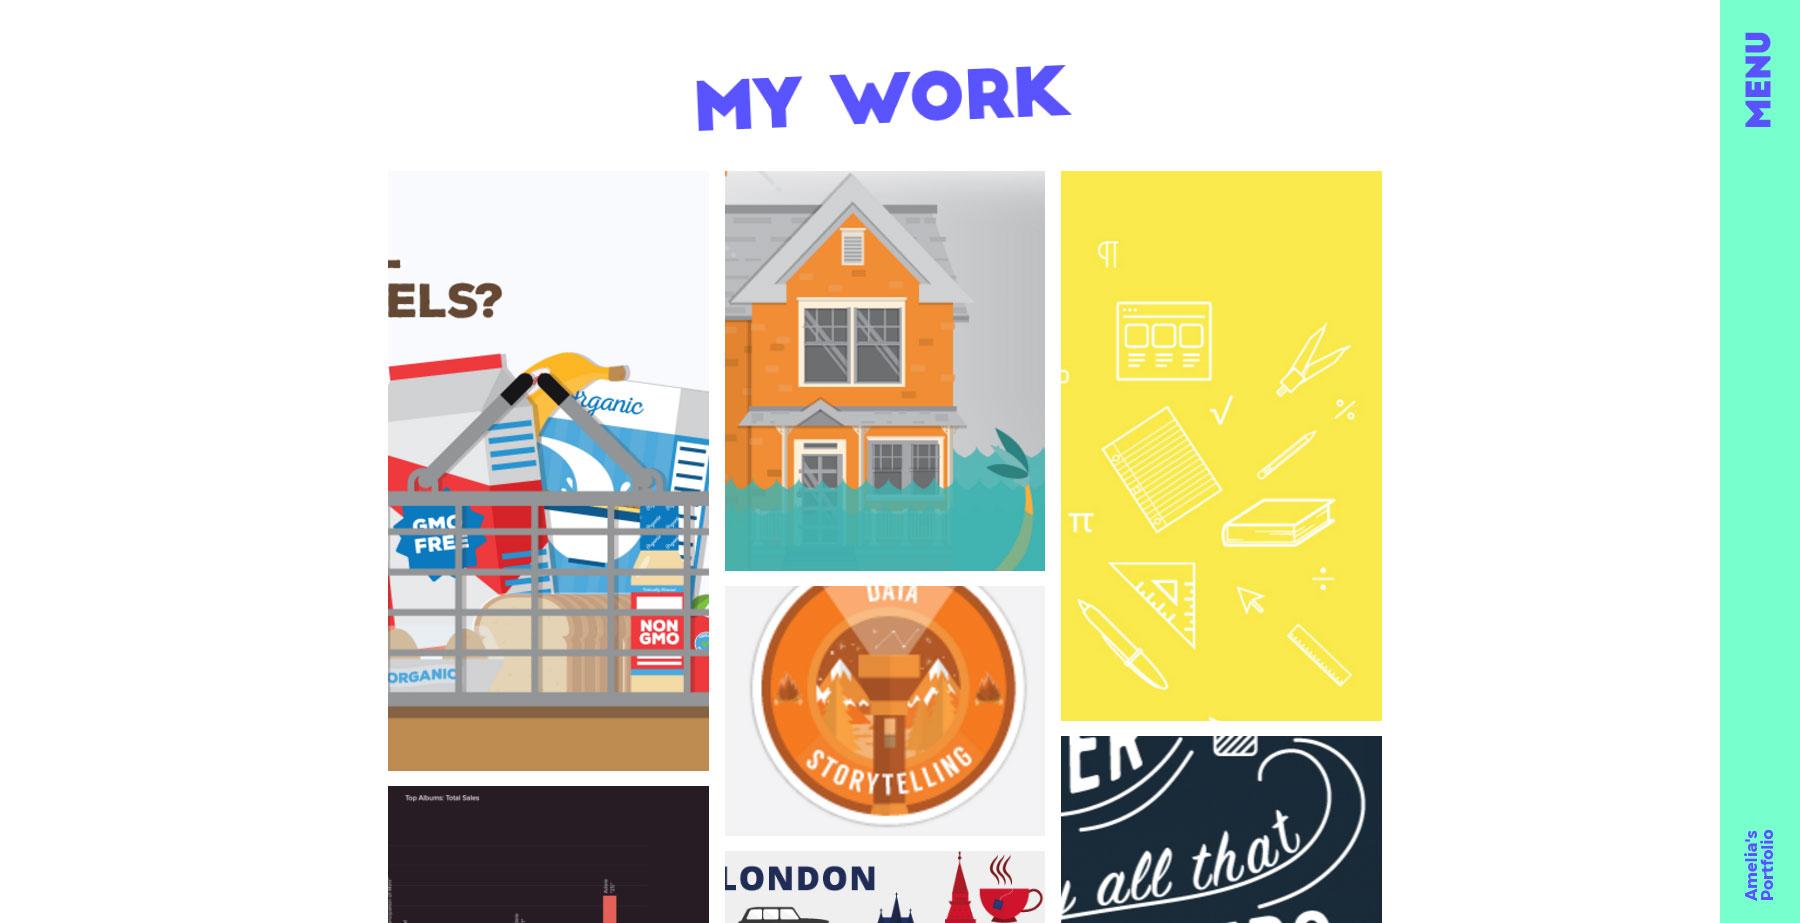 Amelia Thompson's Portfolio - Website of the Day